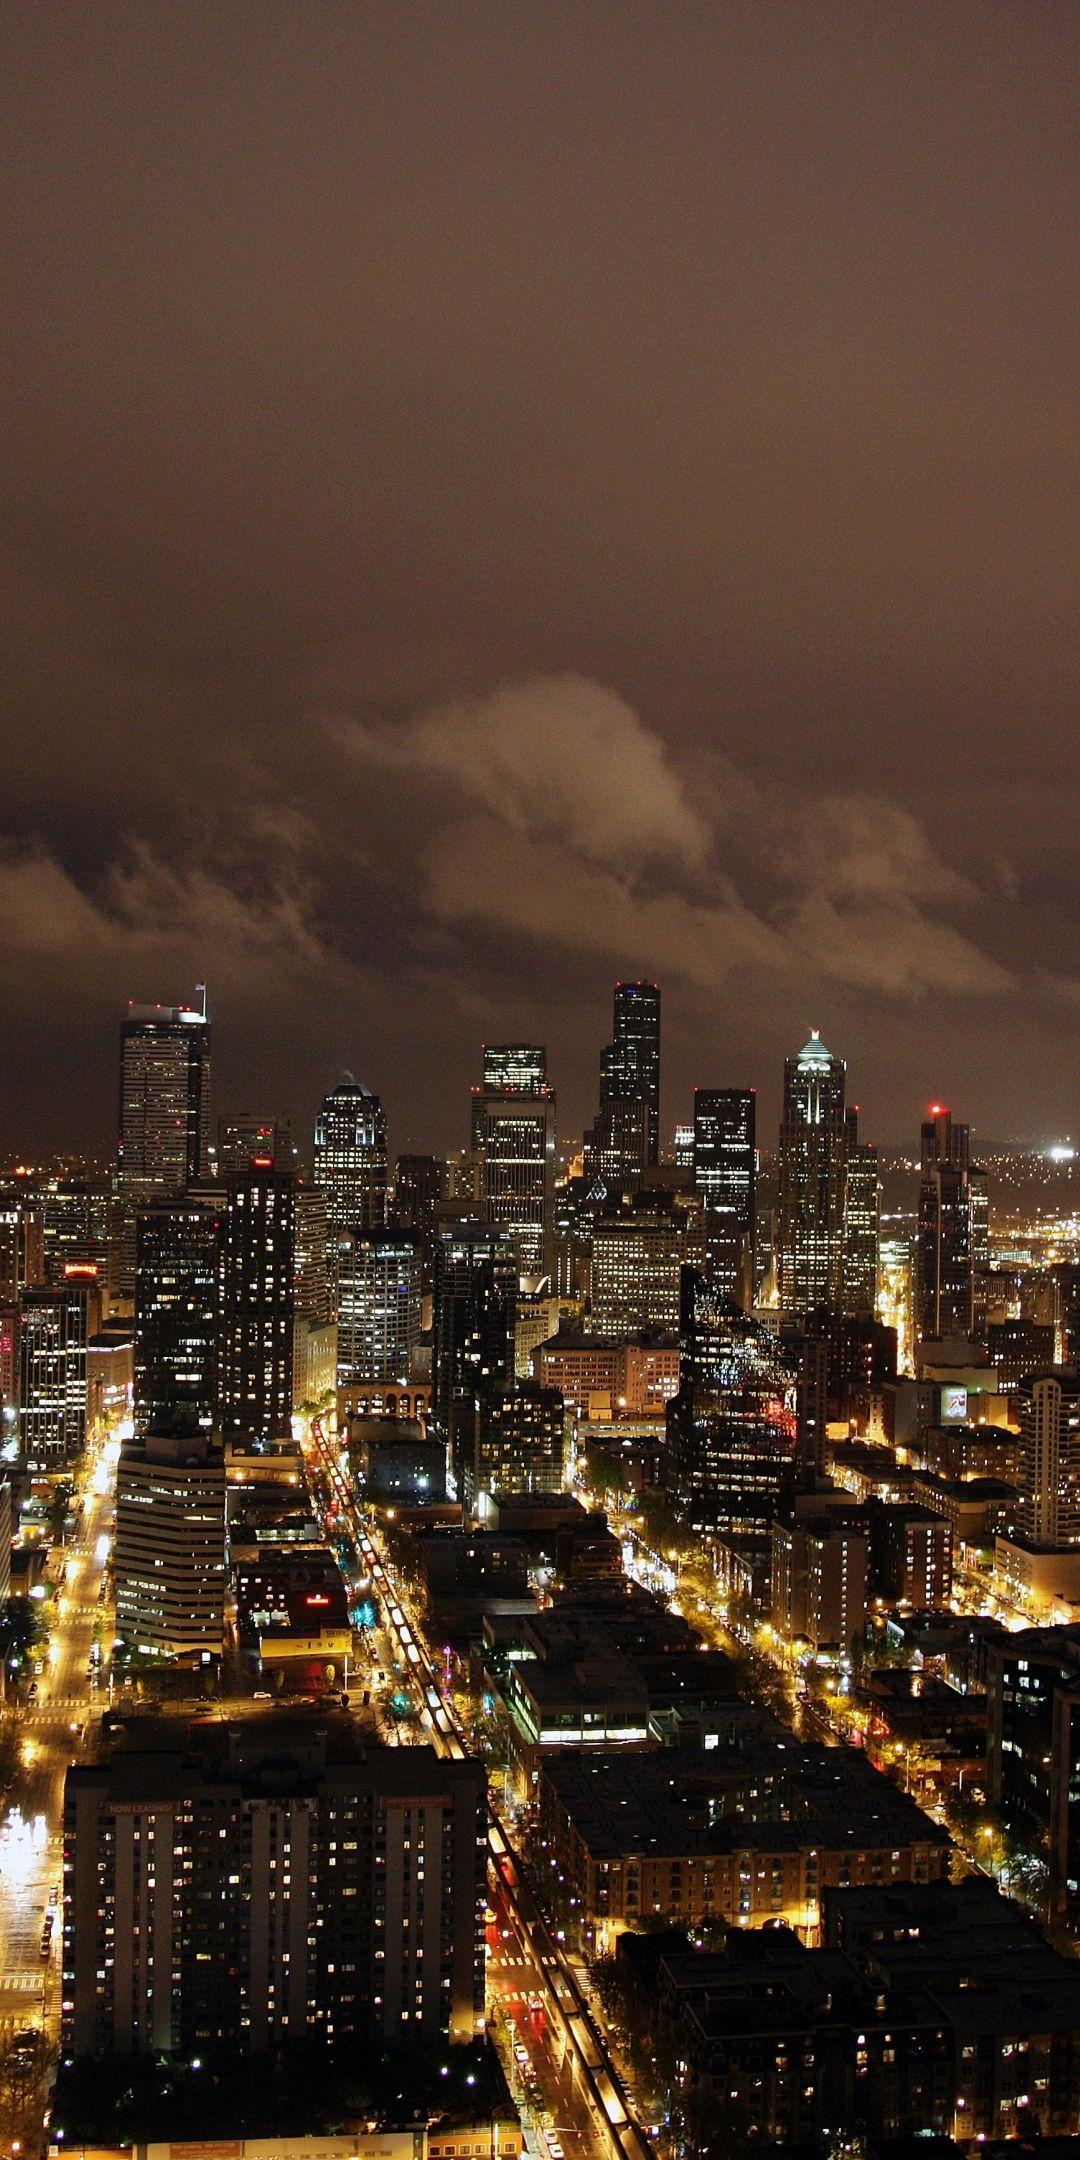 Night City Buildings Skyscrapers Dark 1080x2160 Wallpaper City Lights Wallpaper City Aesthetic City Lights Quotes